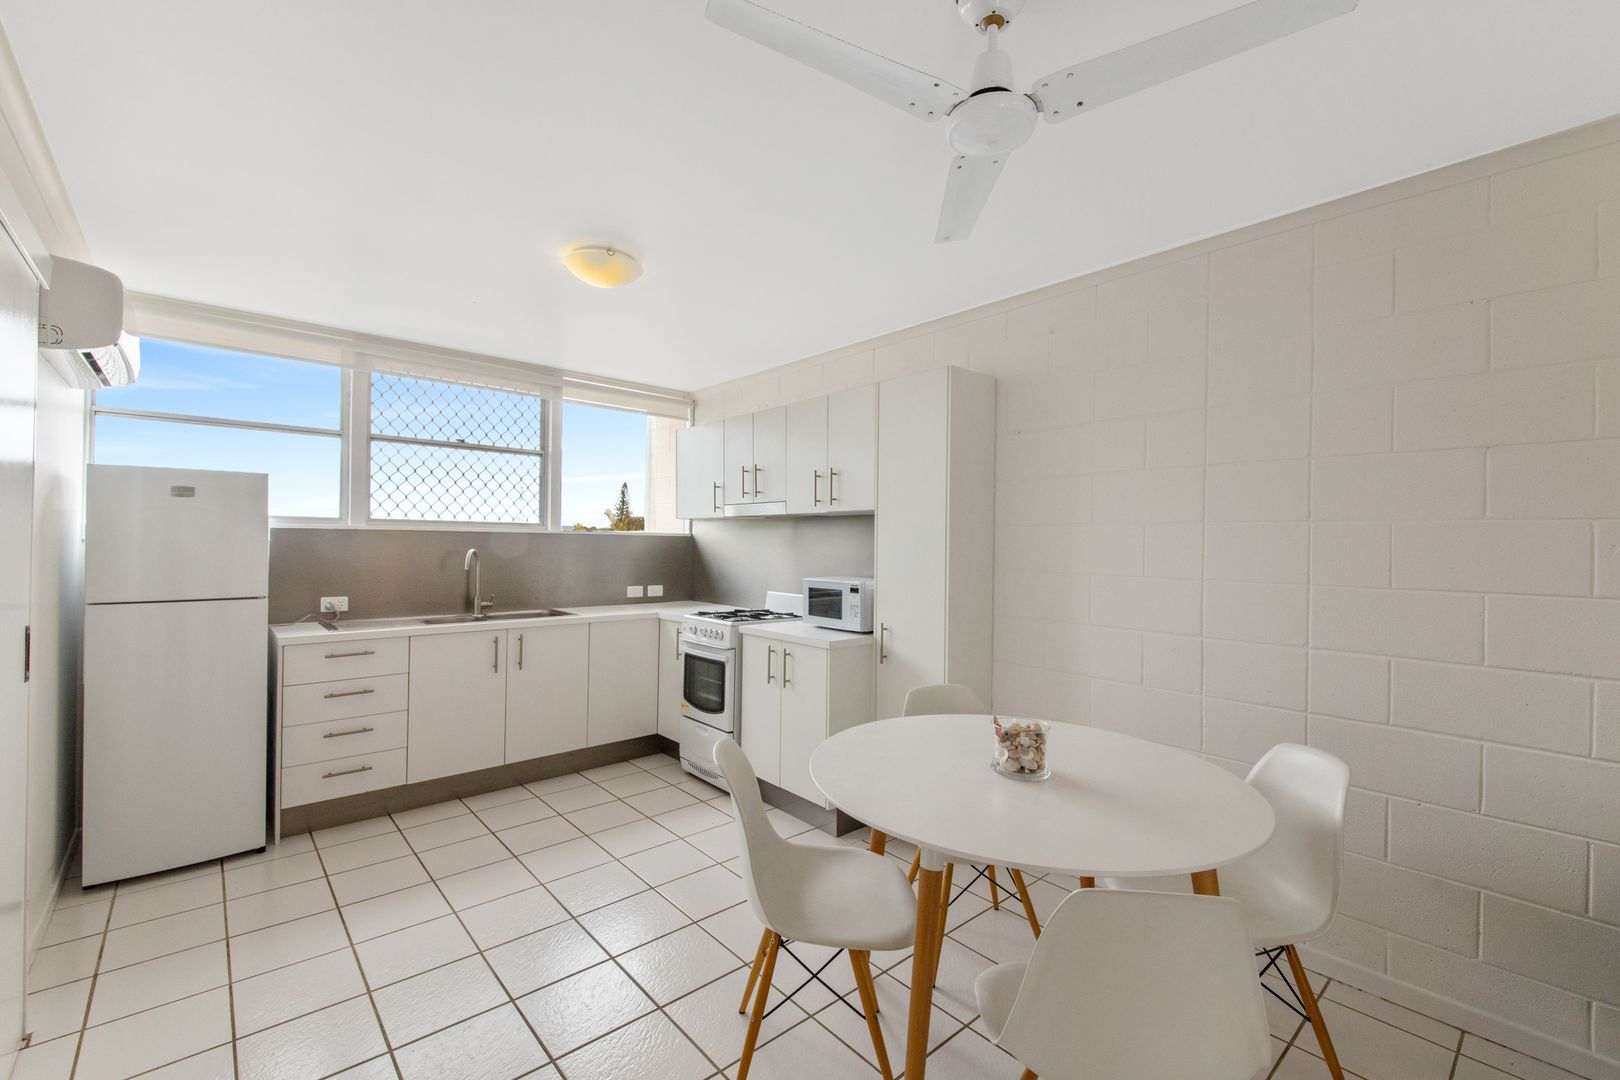 2/5 Ibis Street, Peregian Beach QLD 4573, Image 2